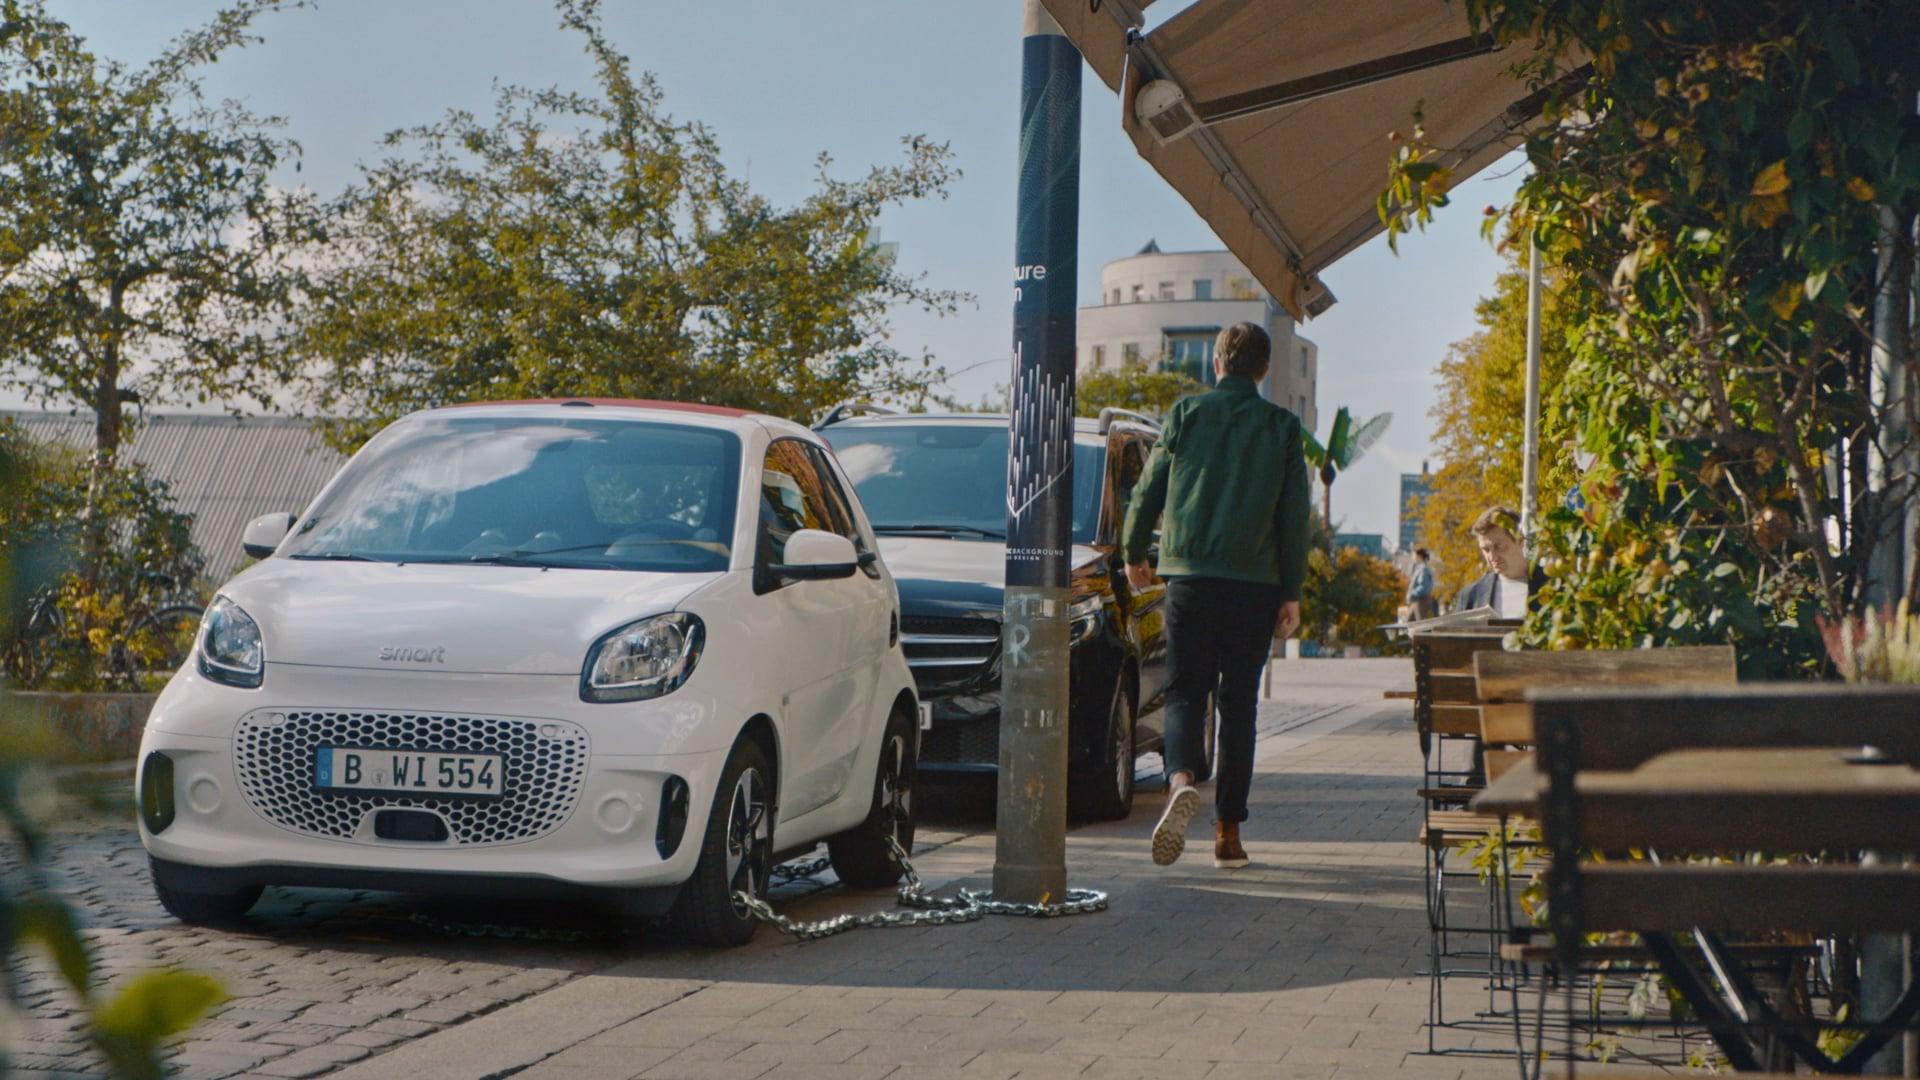 Nicolai Zeitler ▲ Mercedes Benz - Kette Smart